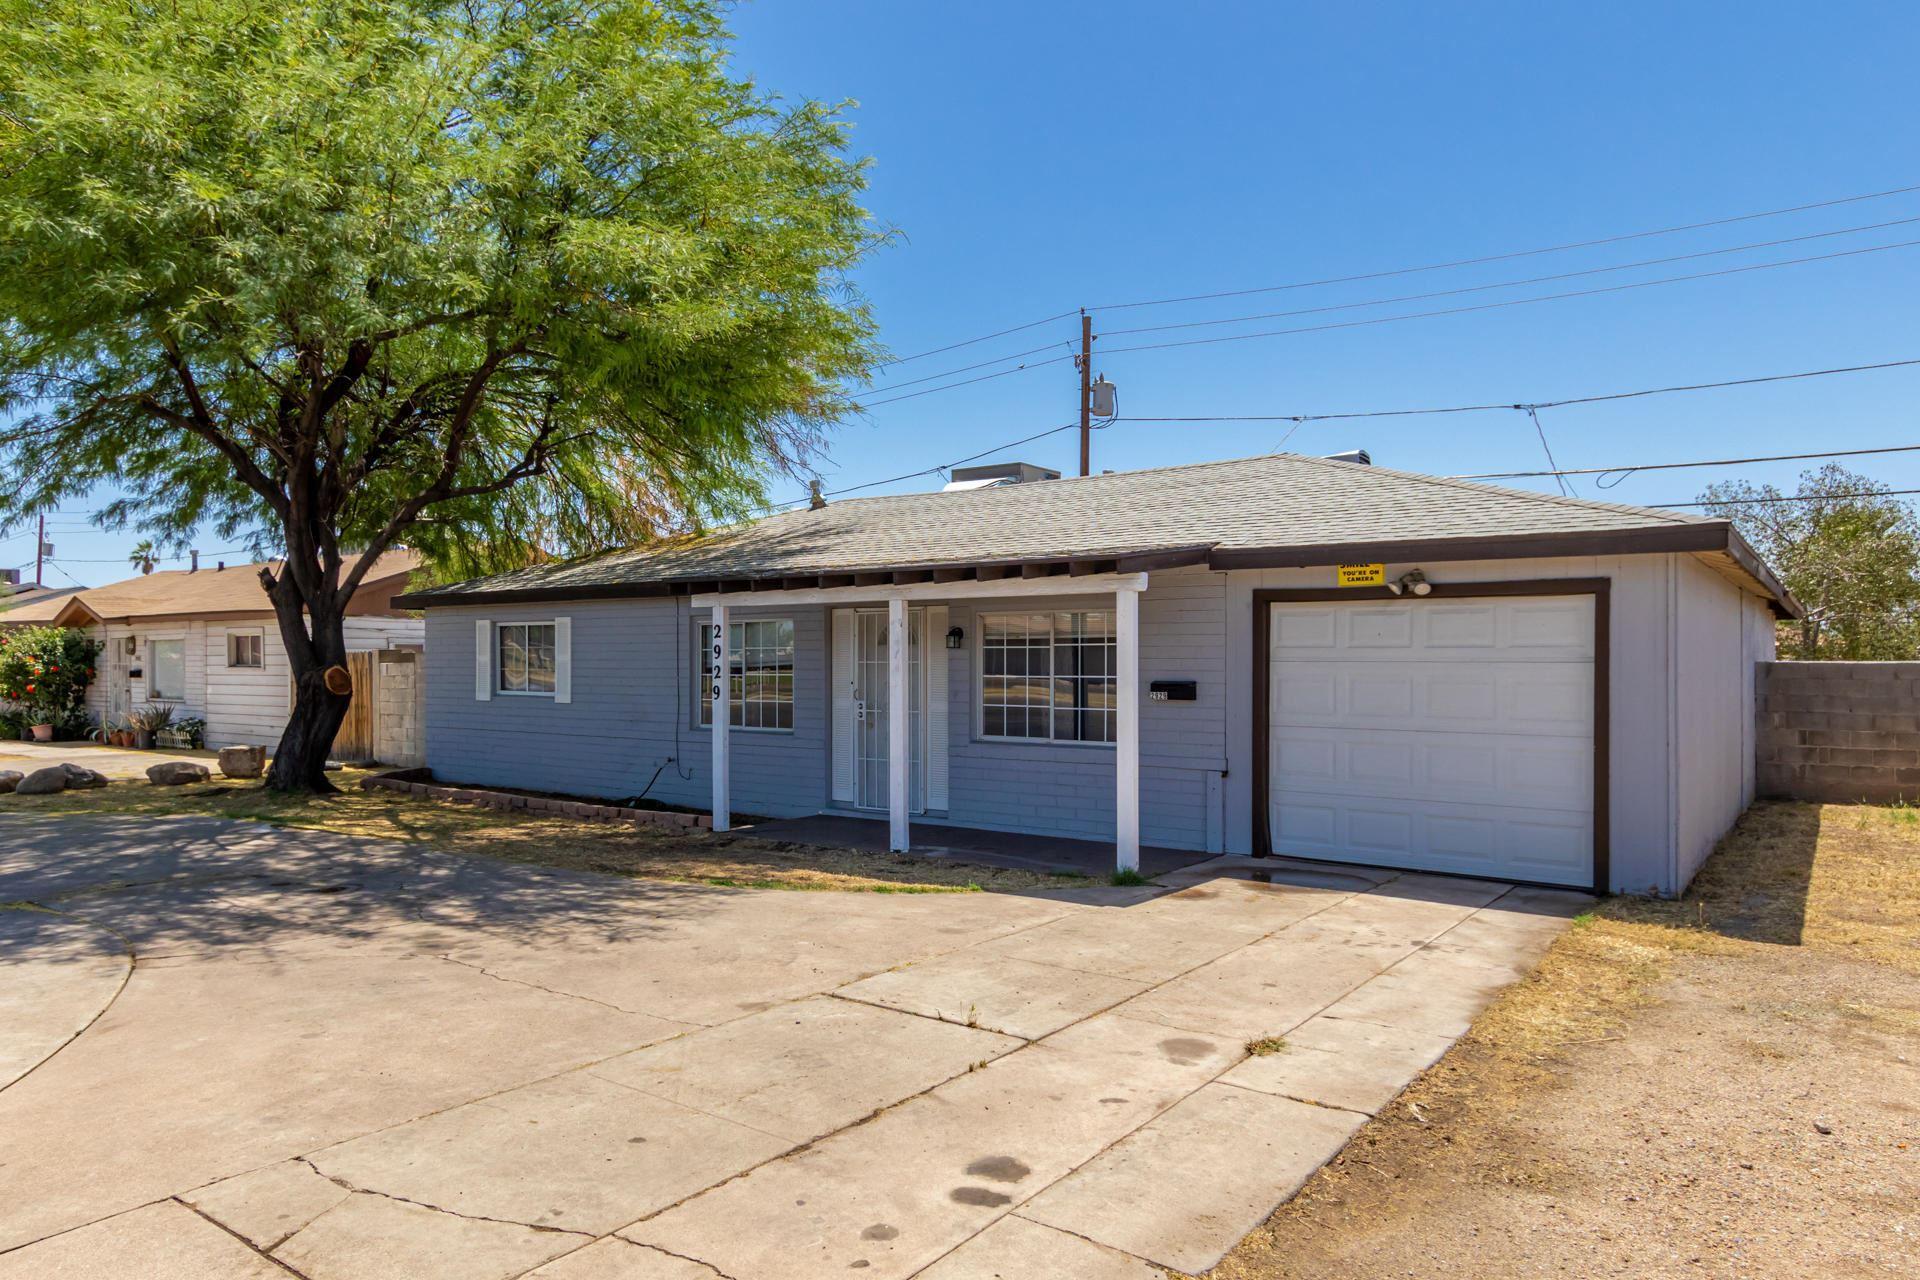 2929 W BETHANY HOME Road, Phoenix, AZ 85017 - MLS#: 6235696